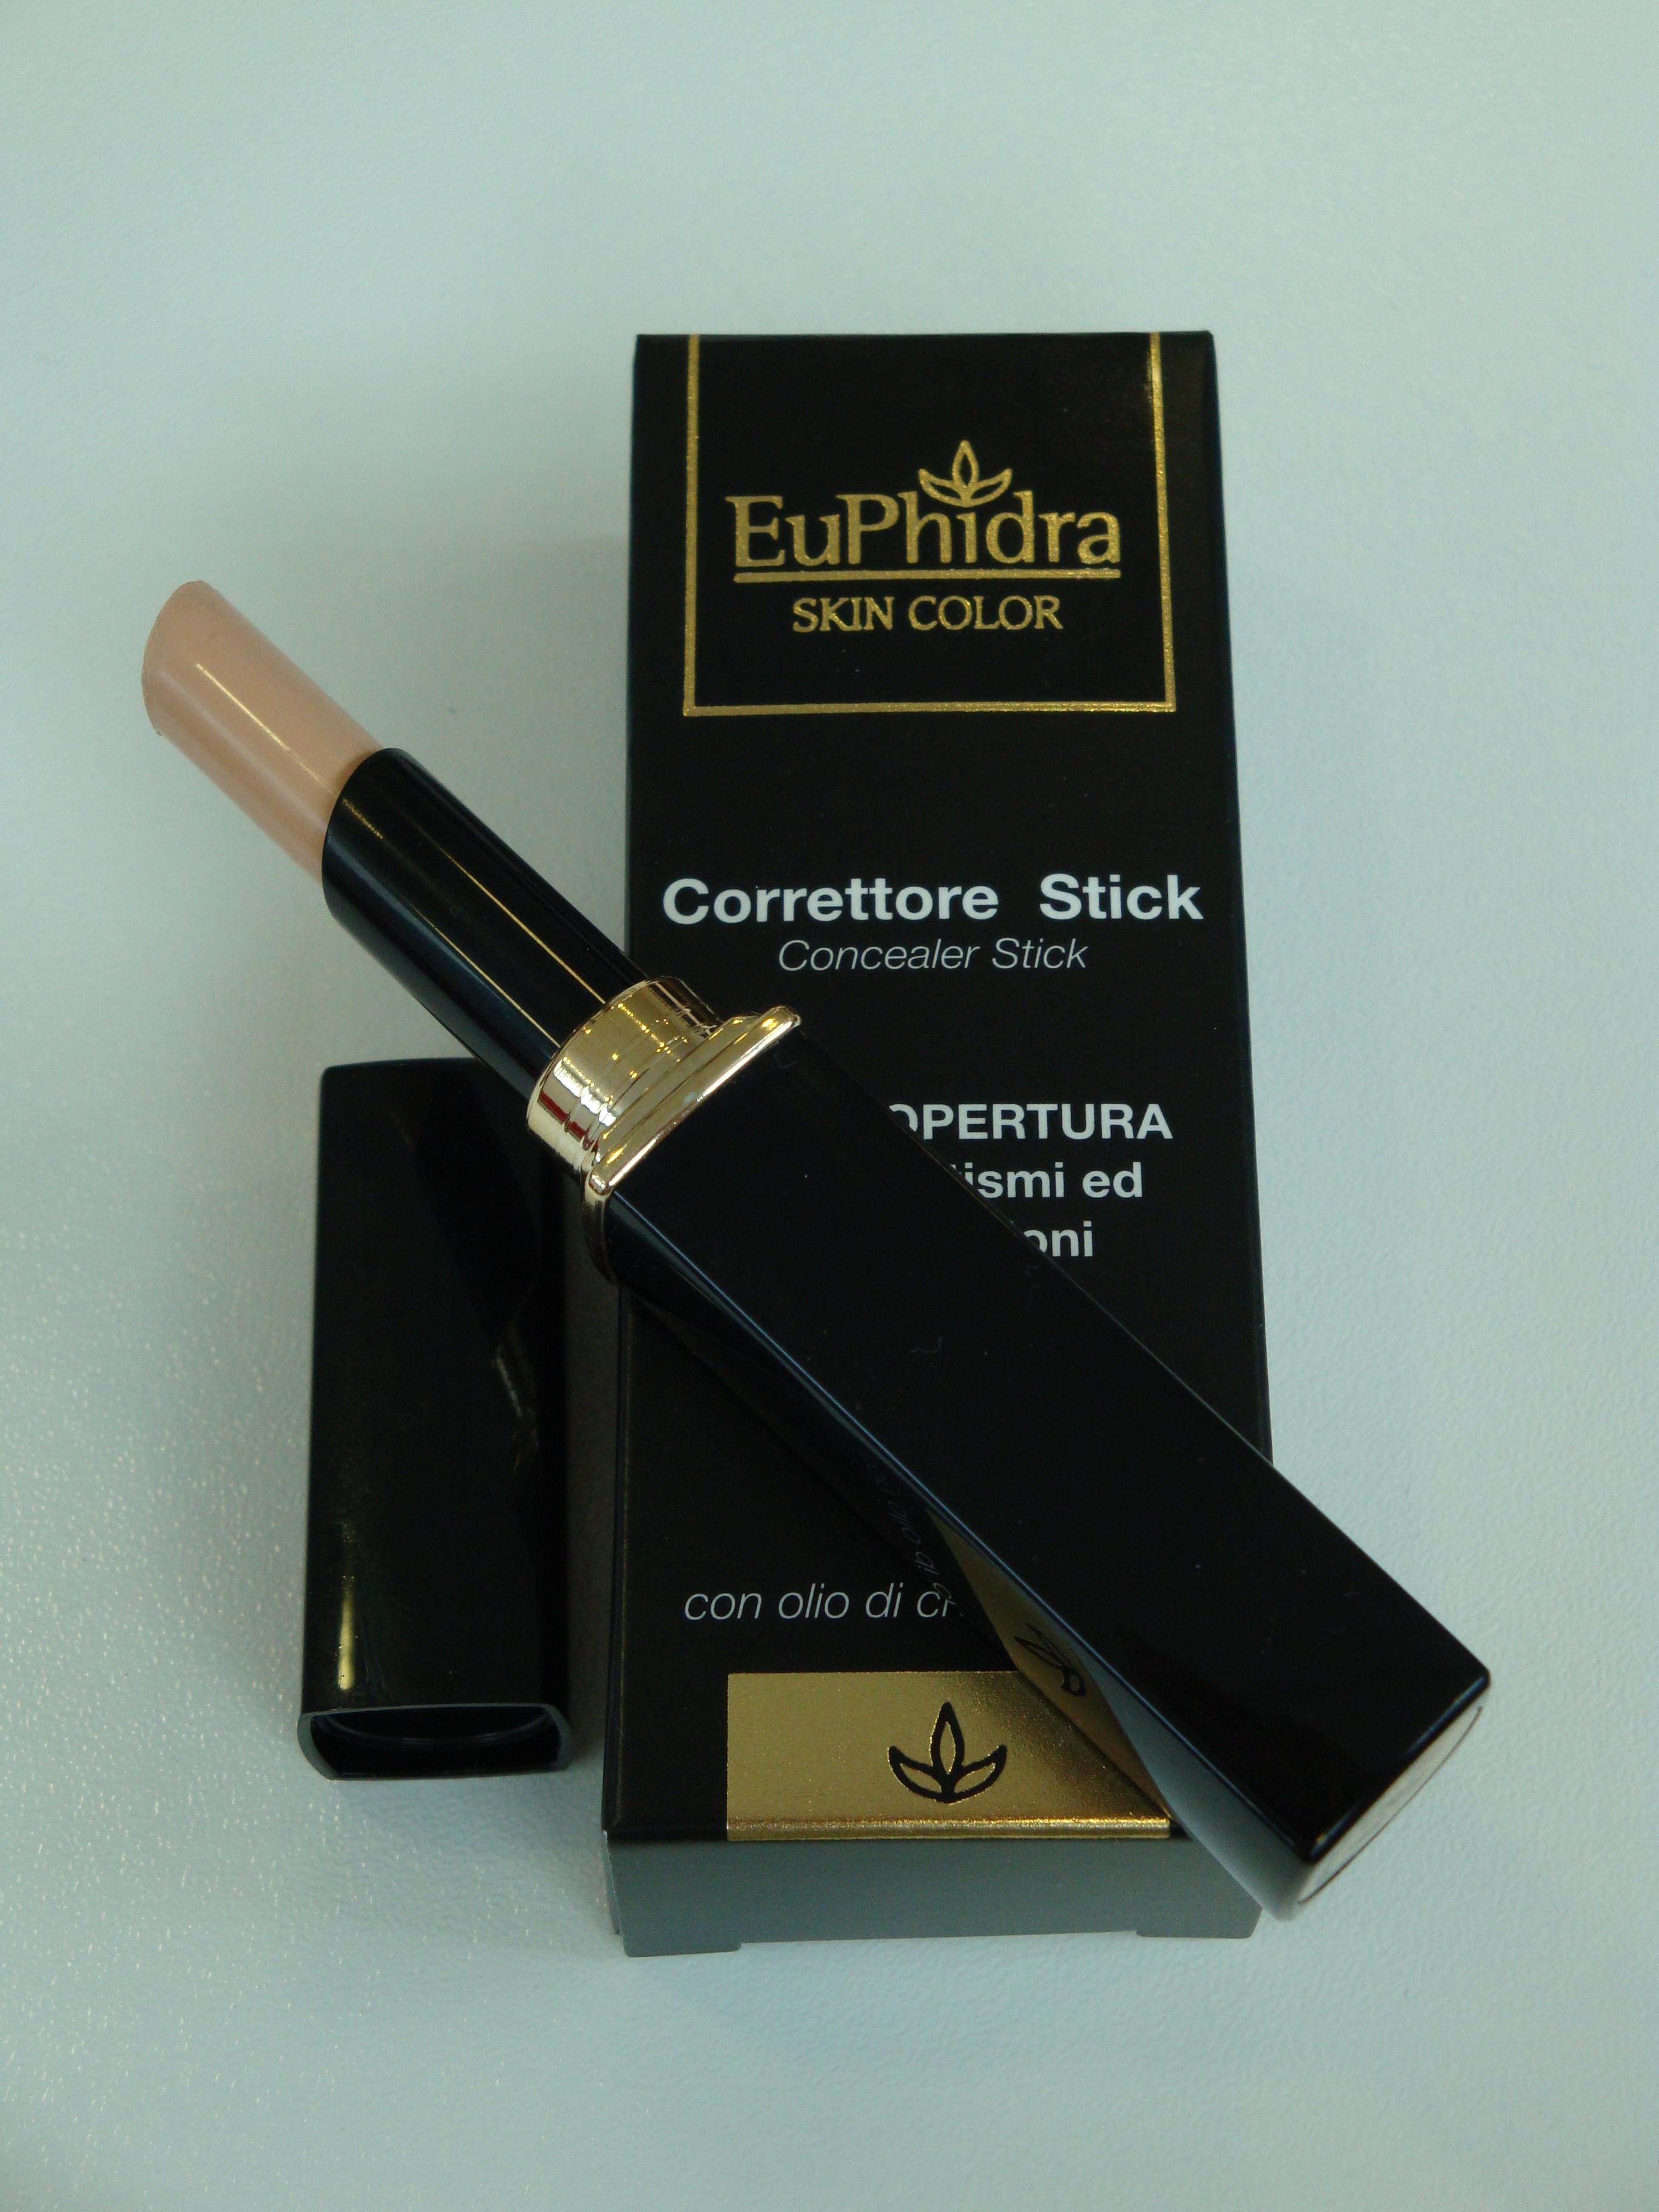 EuPhidra correttore stick